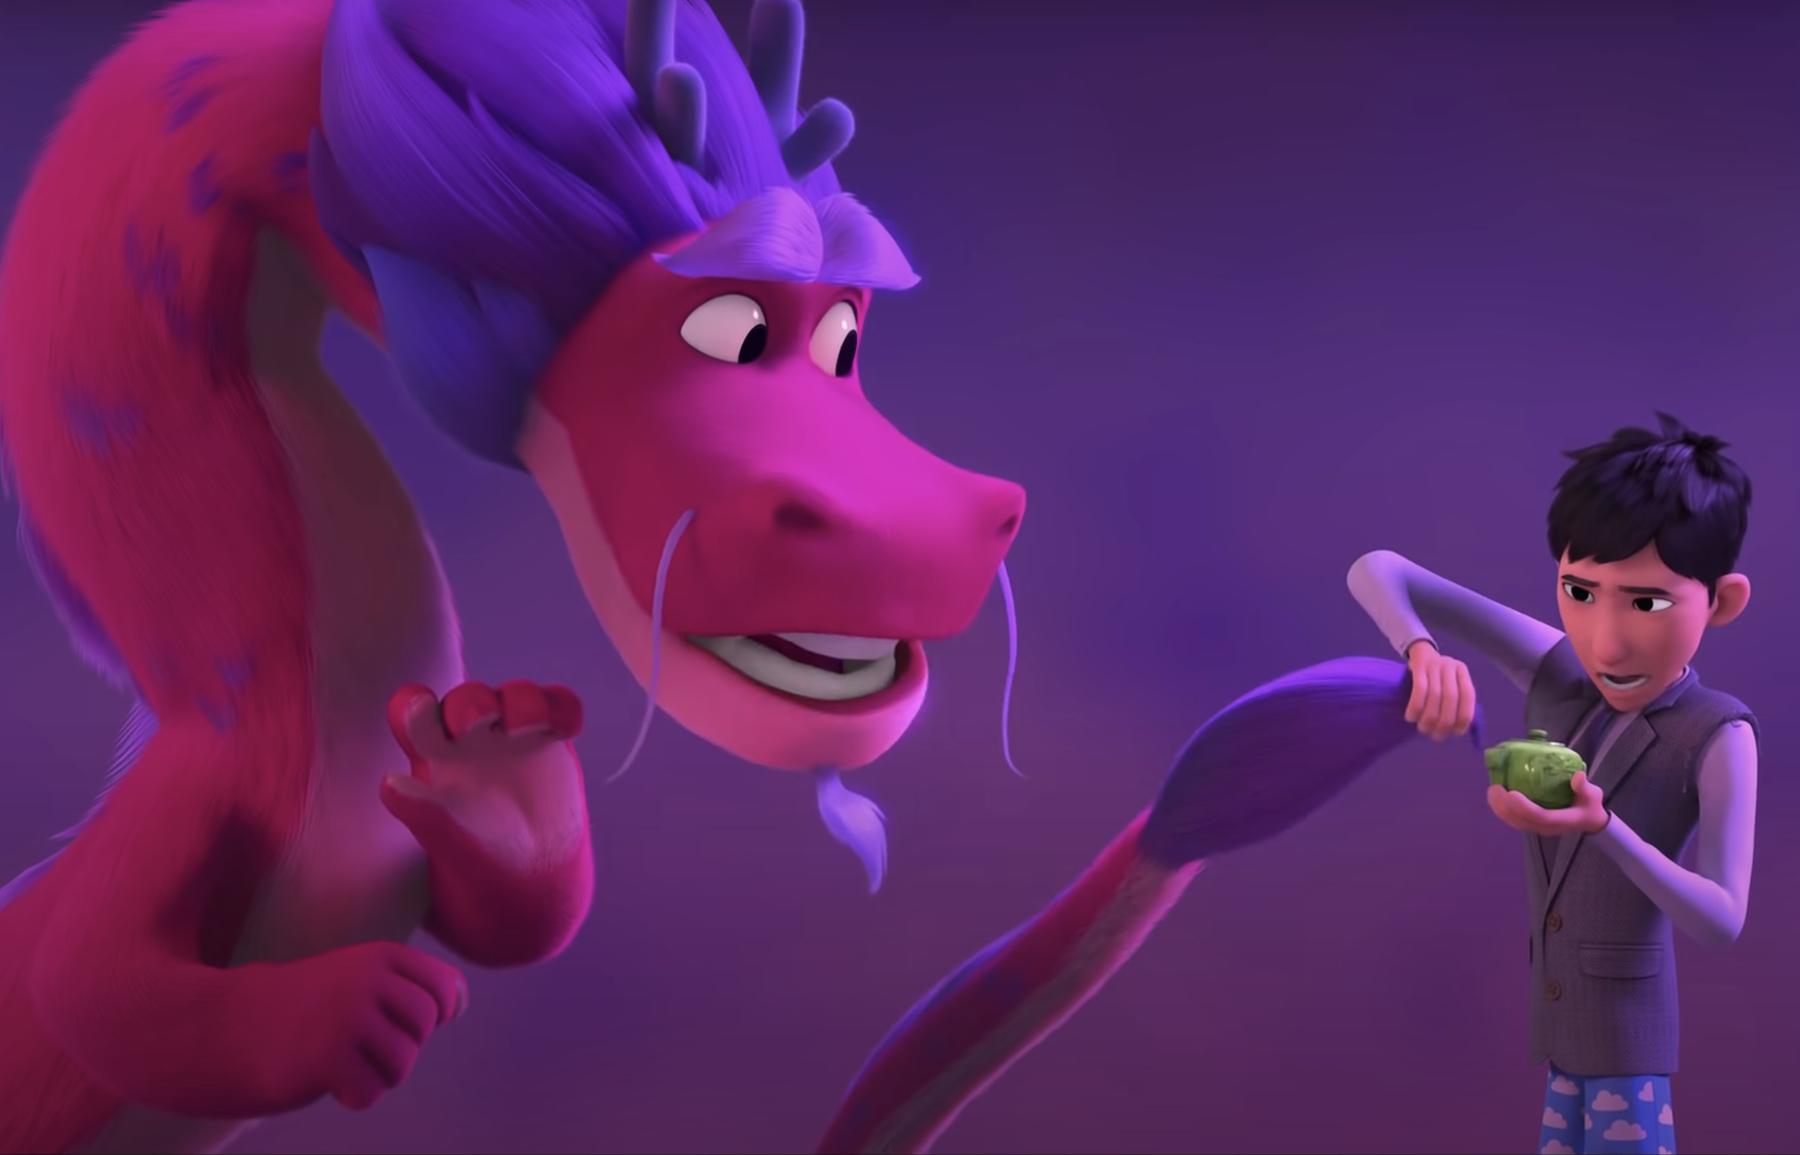 John Cho, Constance Wu Voice Animated 'Wish Dragon': Watch trailer - Rolling Stone